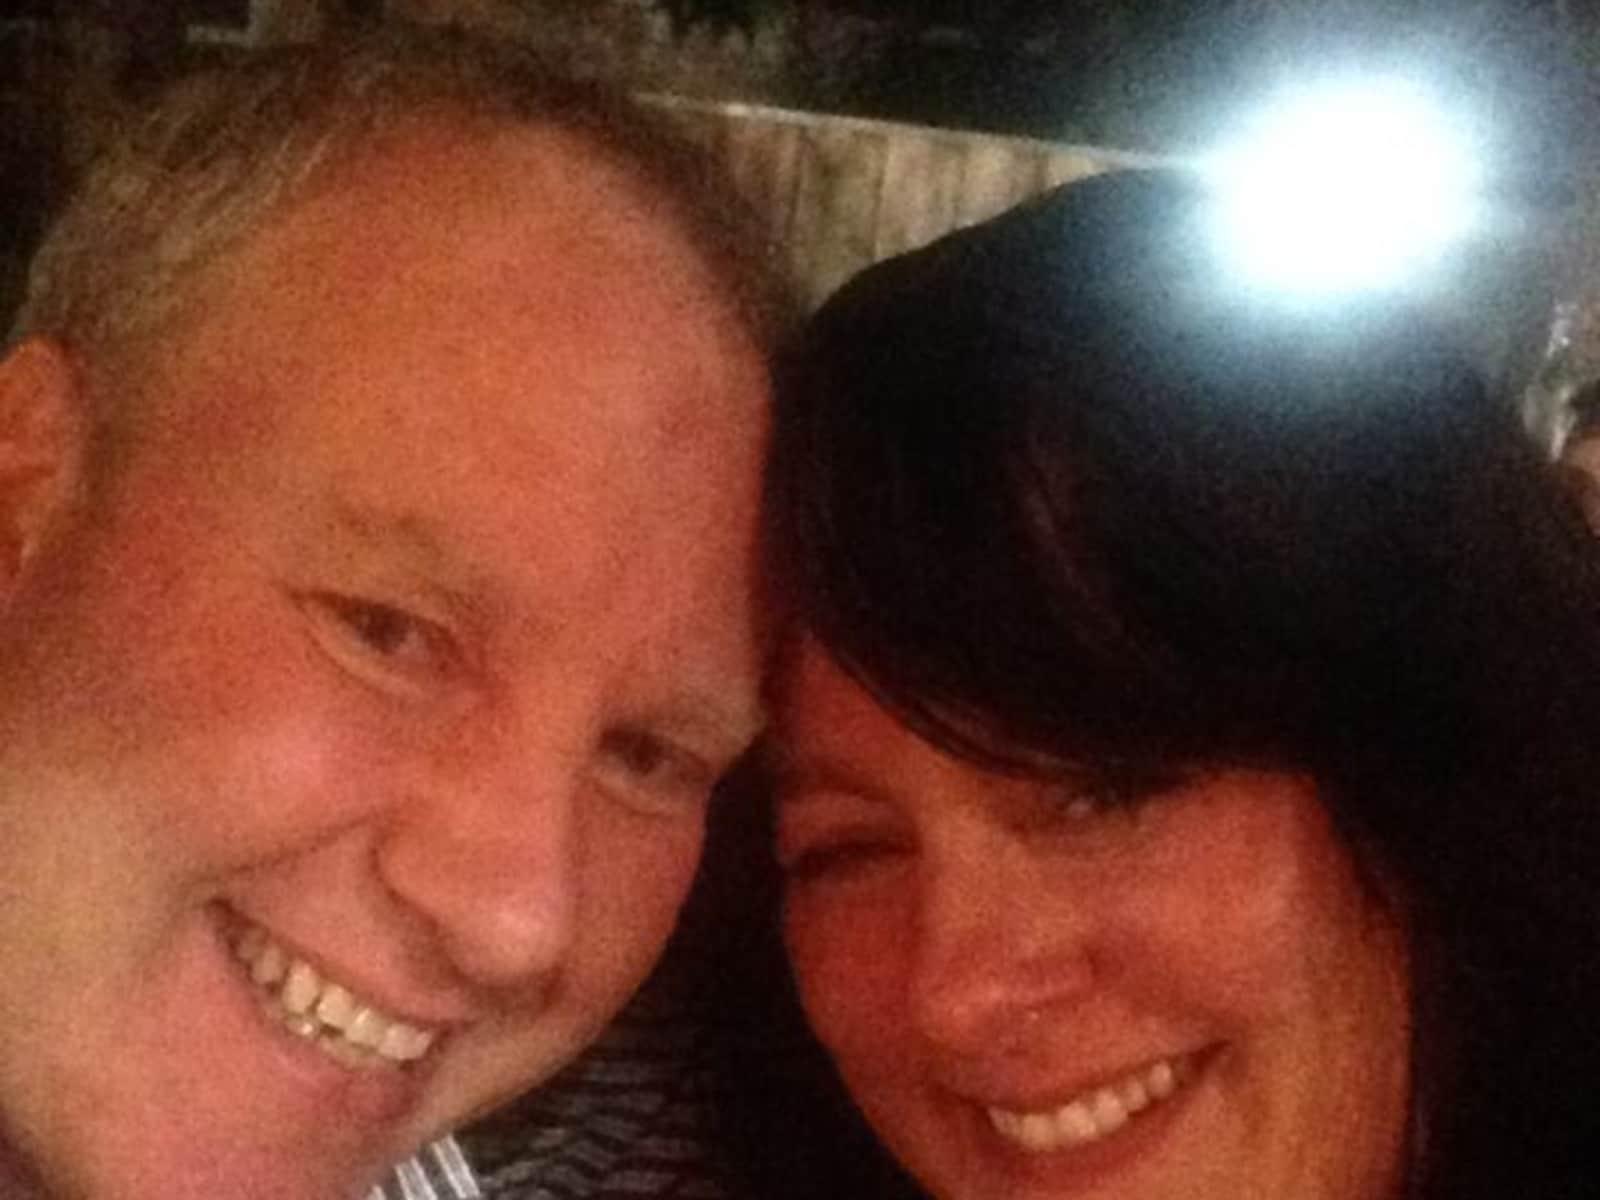 Cindy & Paul from Perth, Western Australia, Australia